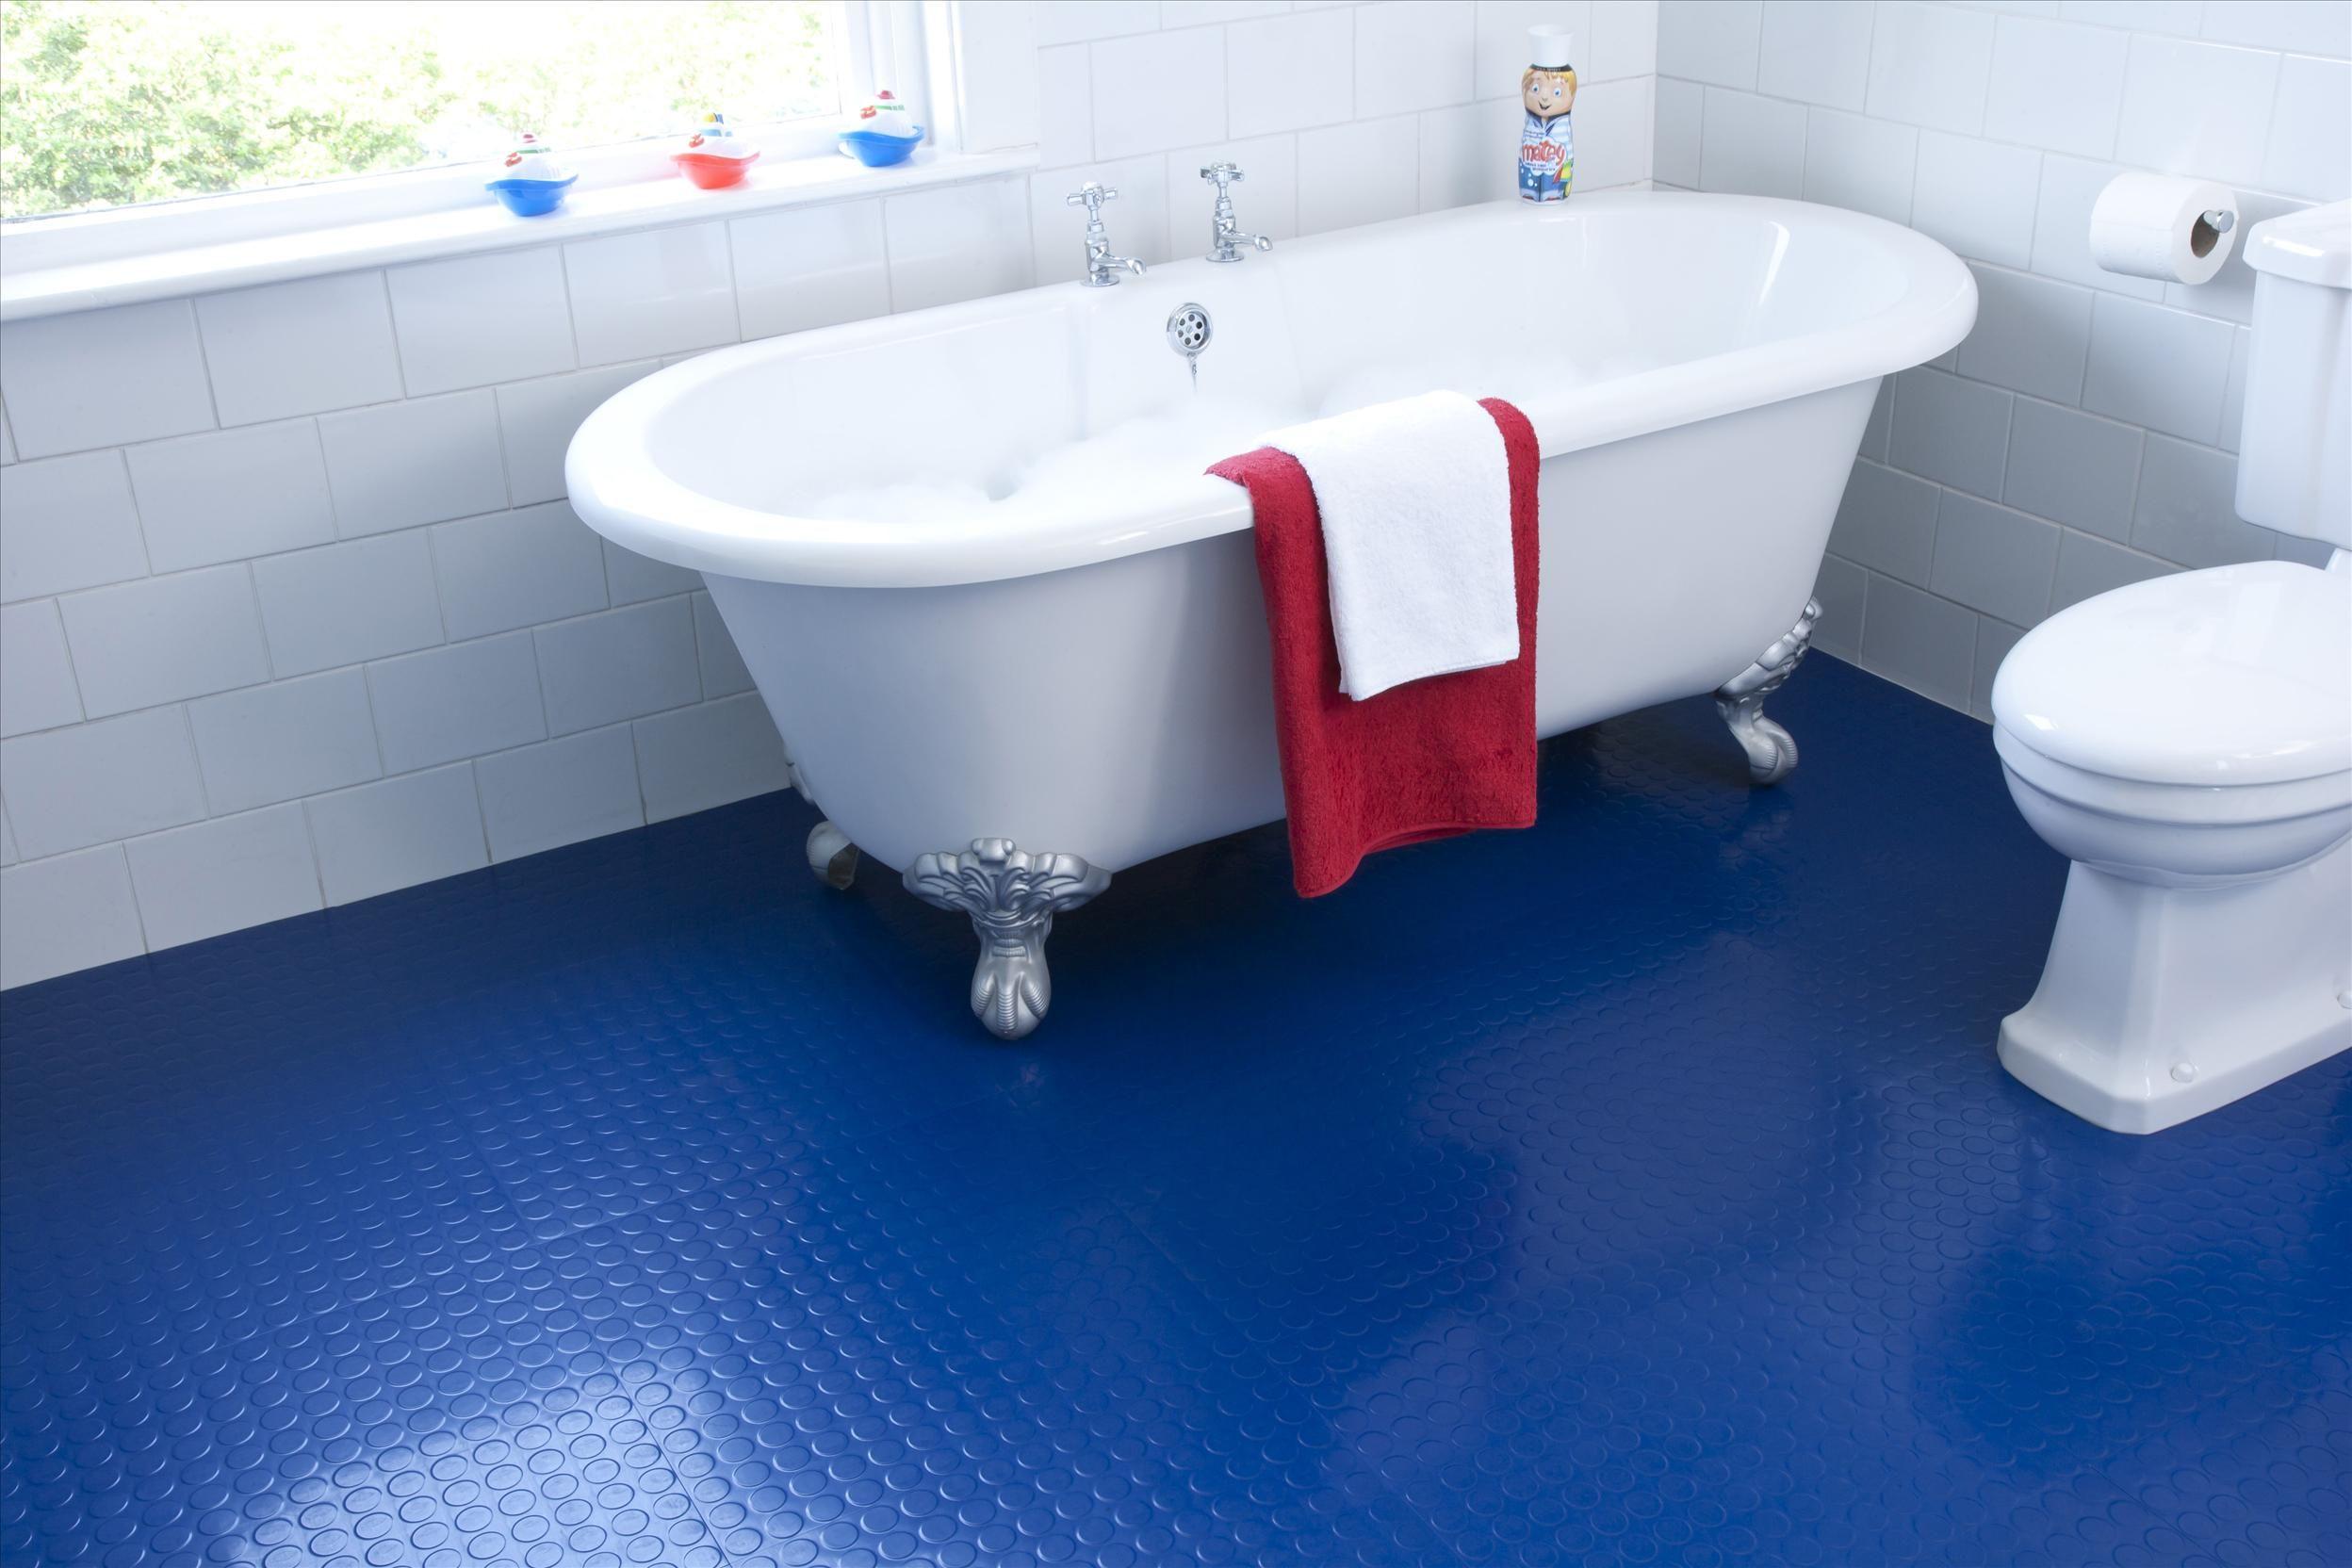 Royal blue rubber flooring tiles bathroom pinterest rubber cool fancy ideas cool fancy blue rubber floor tile in minimalist bathroom image id 32108 giesendesign doublecrazyfo Choice Image